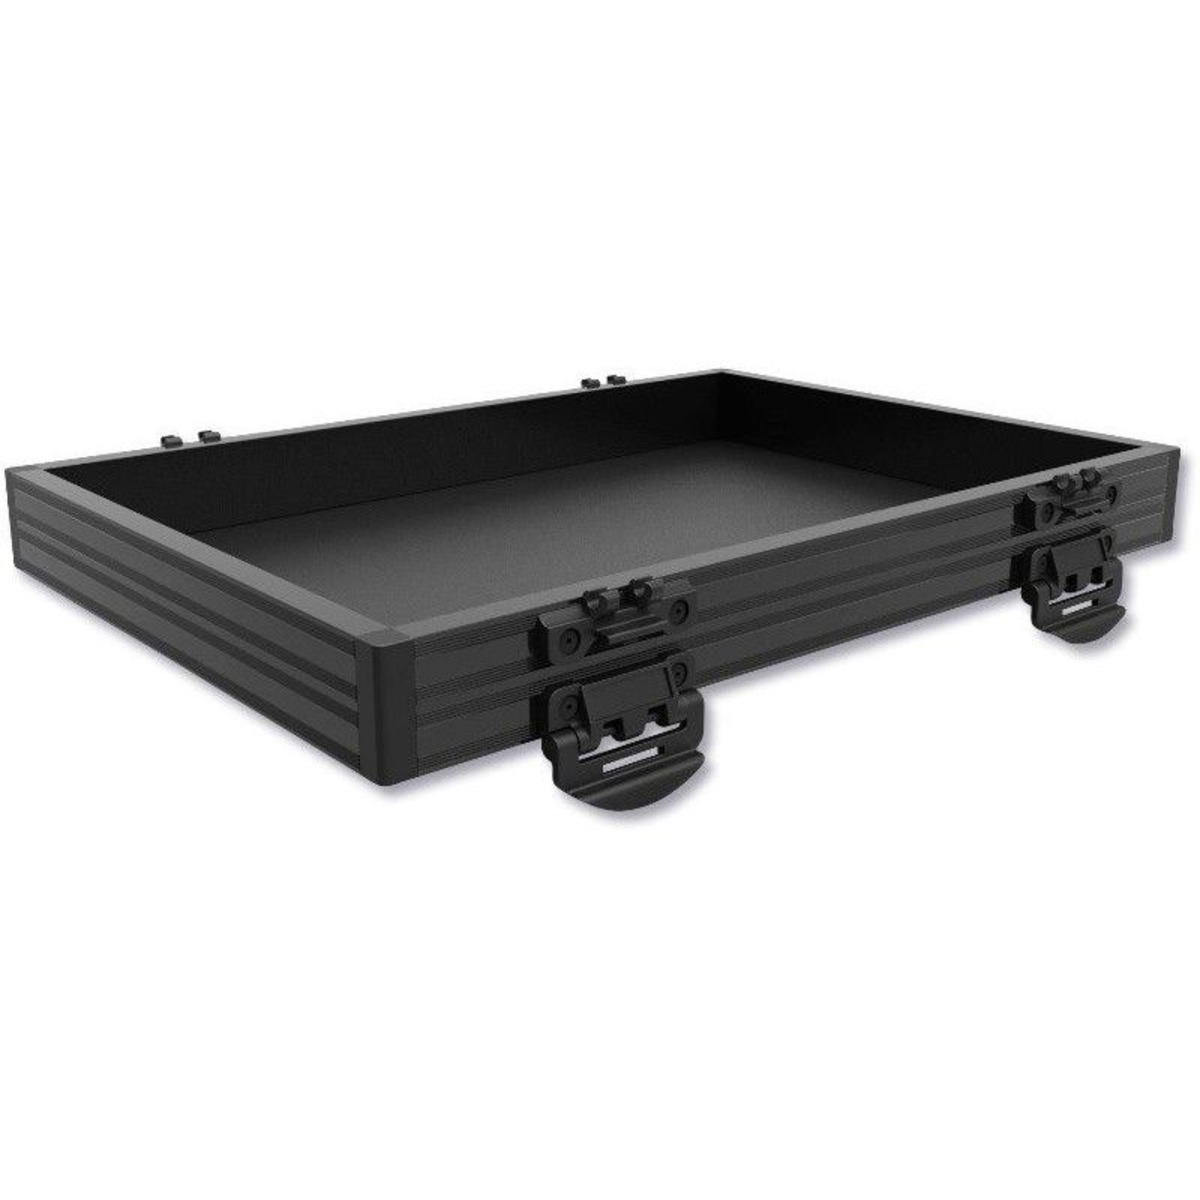 Browning Black Magic Easy Box Tray - 29 cm x 41 cm x 4 cm